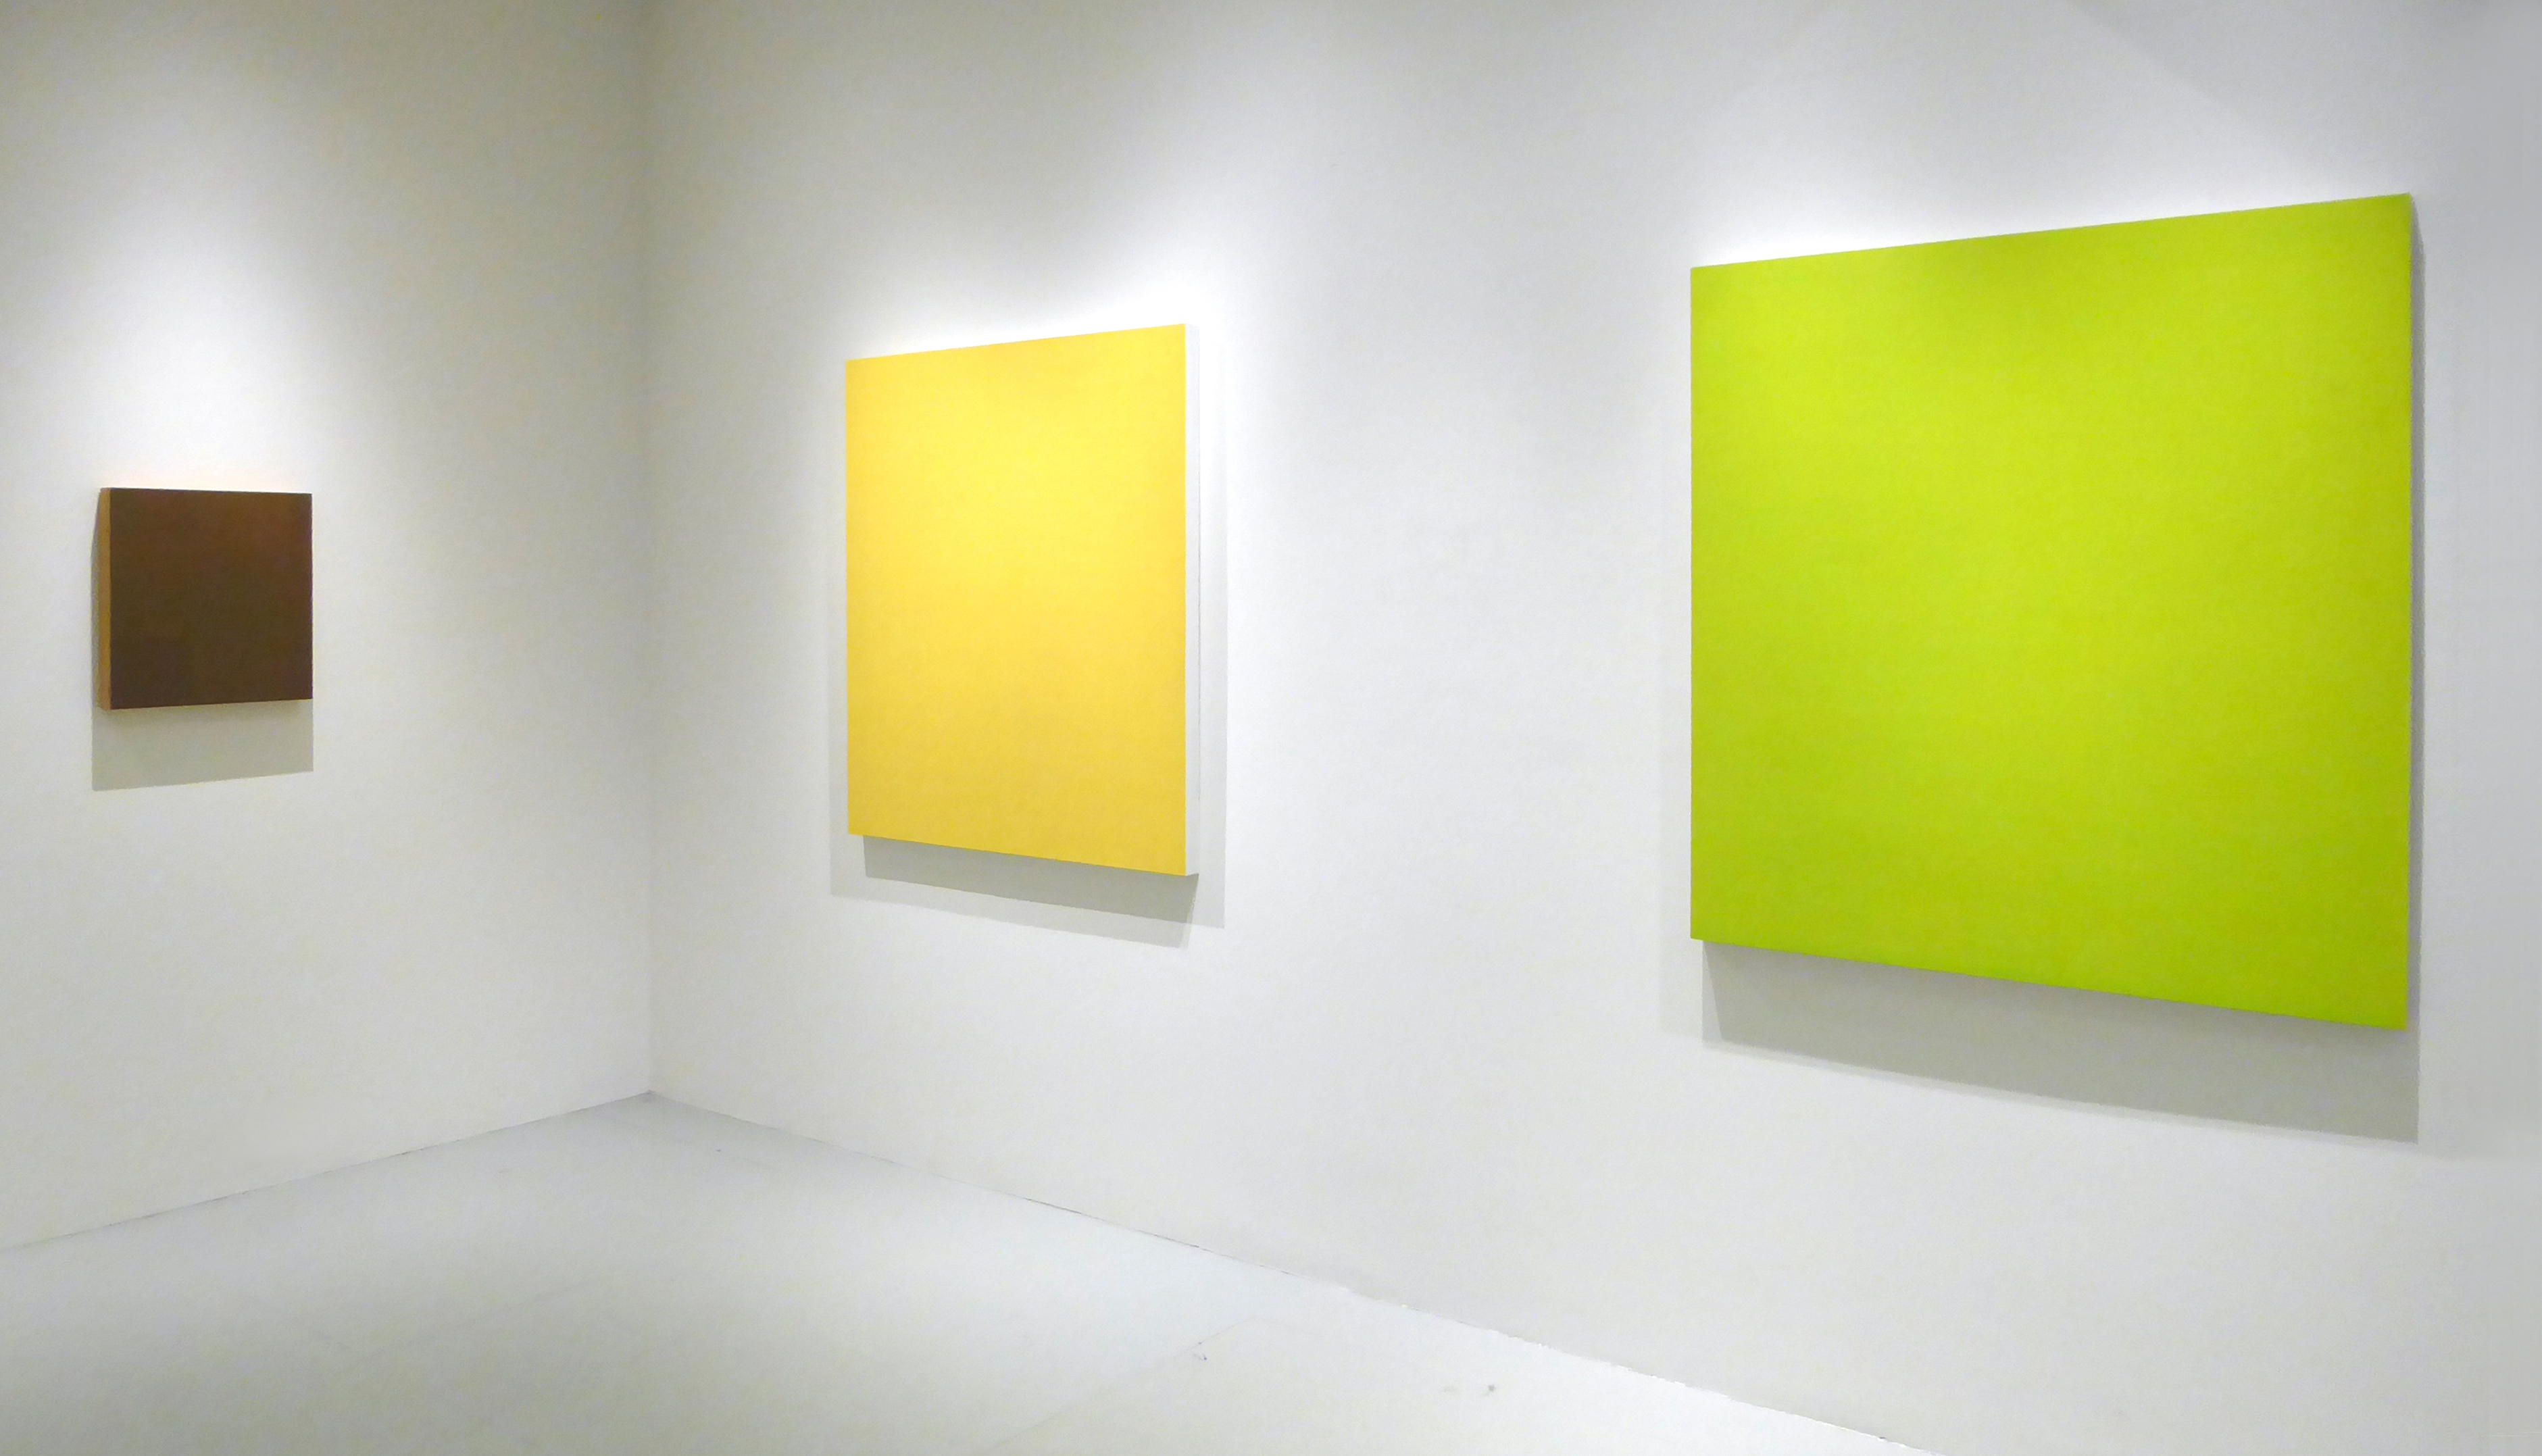 HY_Gallery_instalatino_shot.jpg